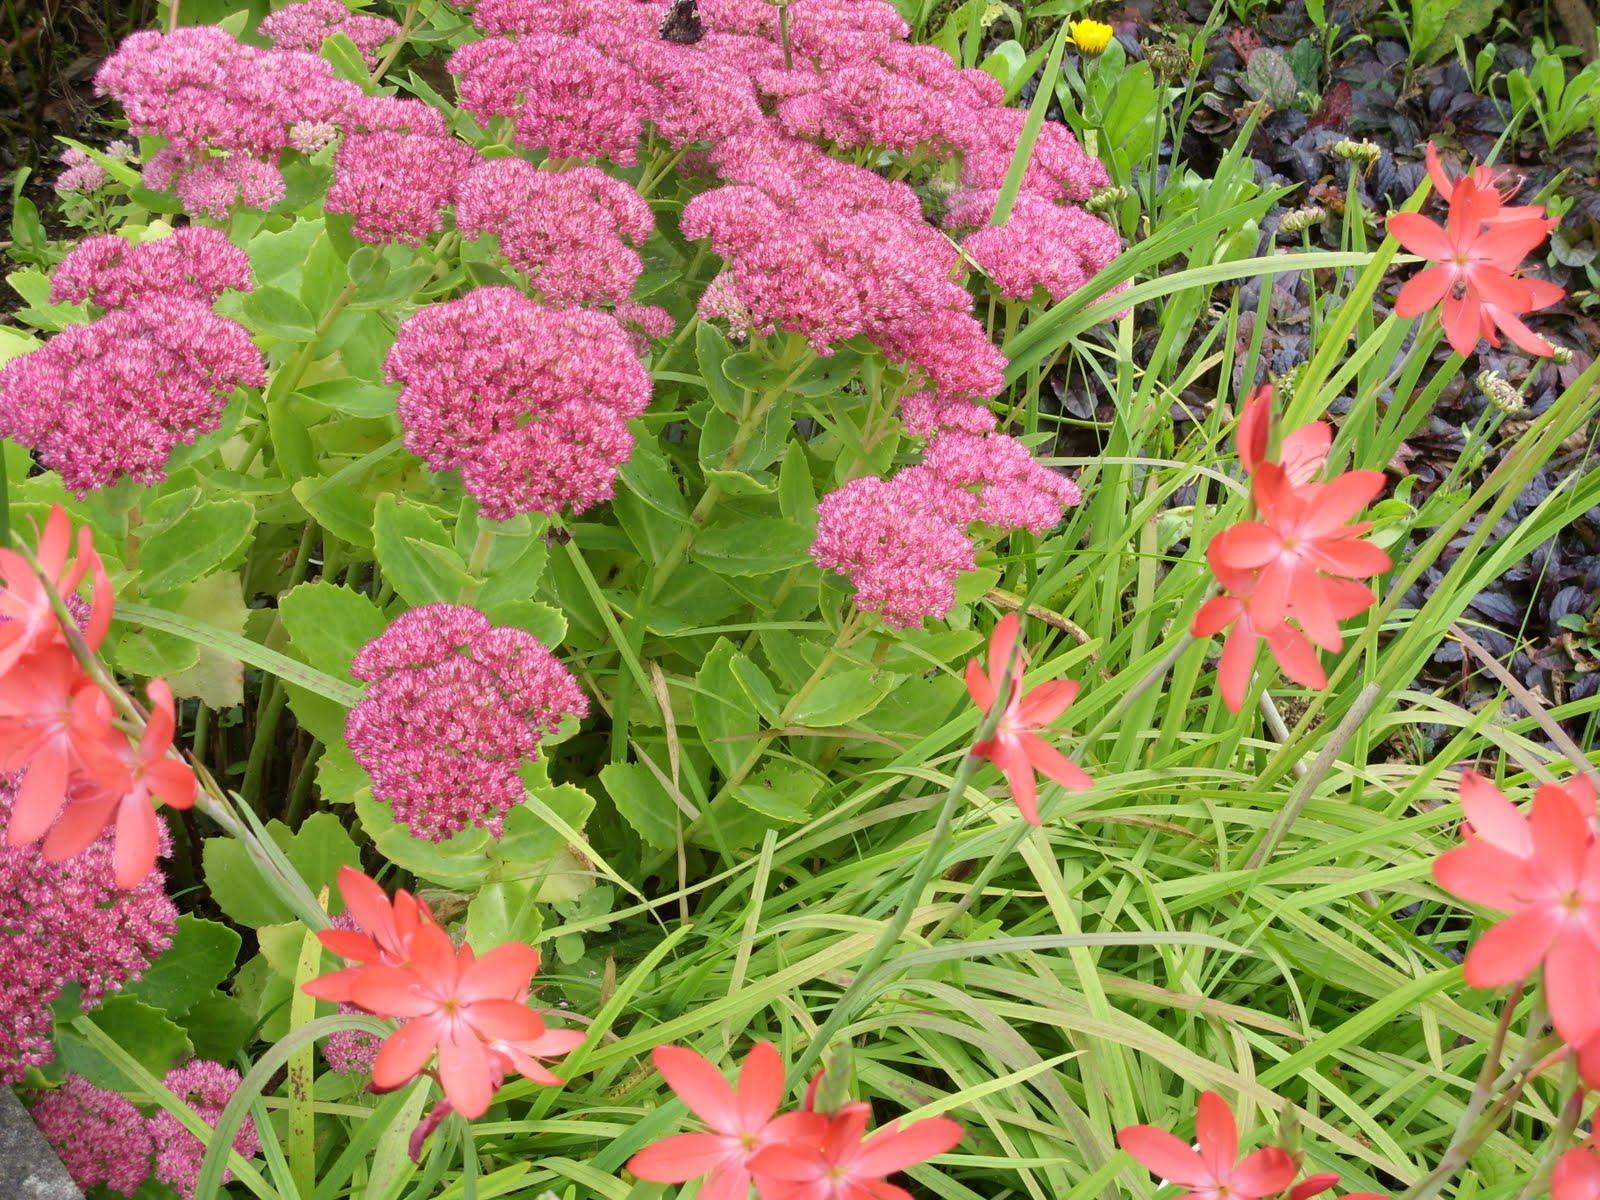 Kellis Northern Ireland Garden Autumn Colour Perennials N Shrubs